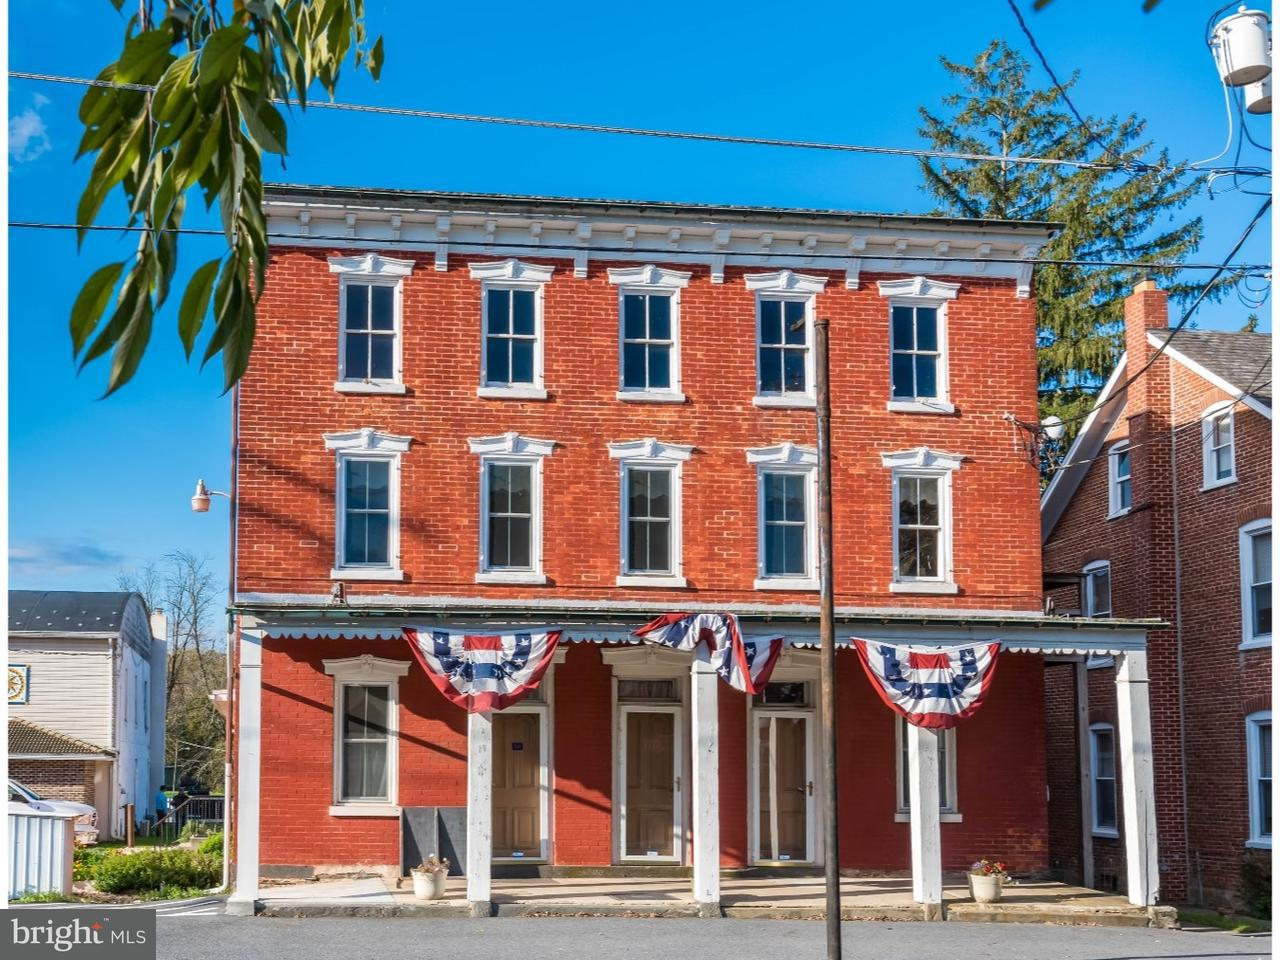 Single Family Home for Sale at 458 E MAIN Street Virginville, Pennsylvania 19564 United States